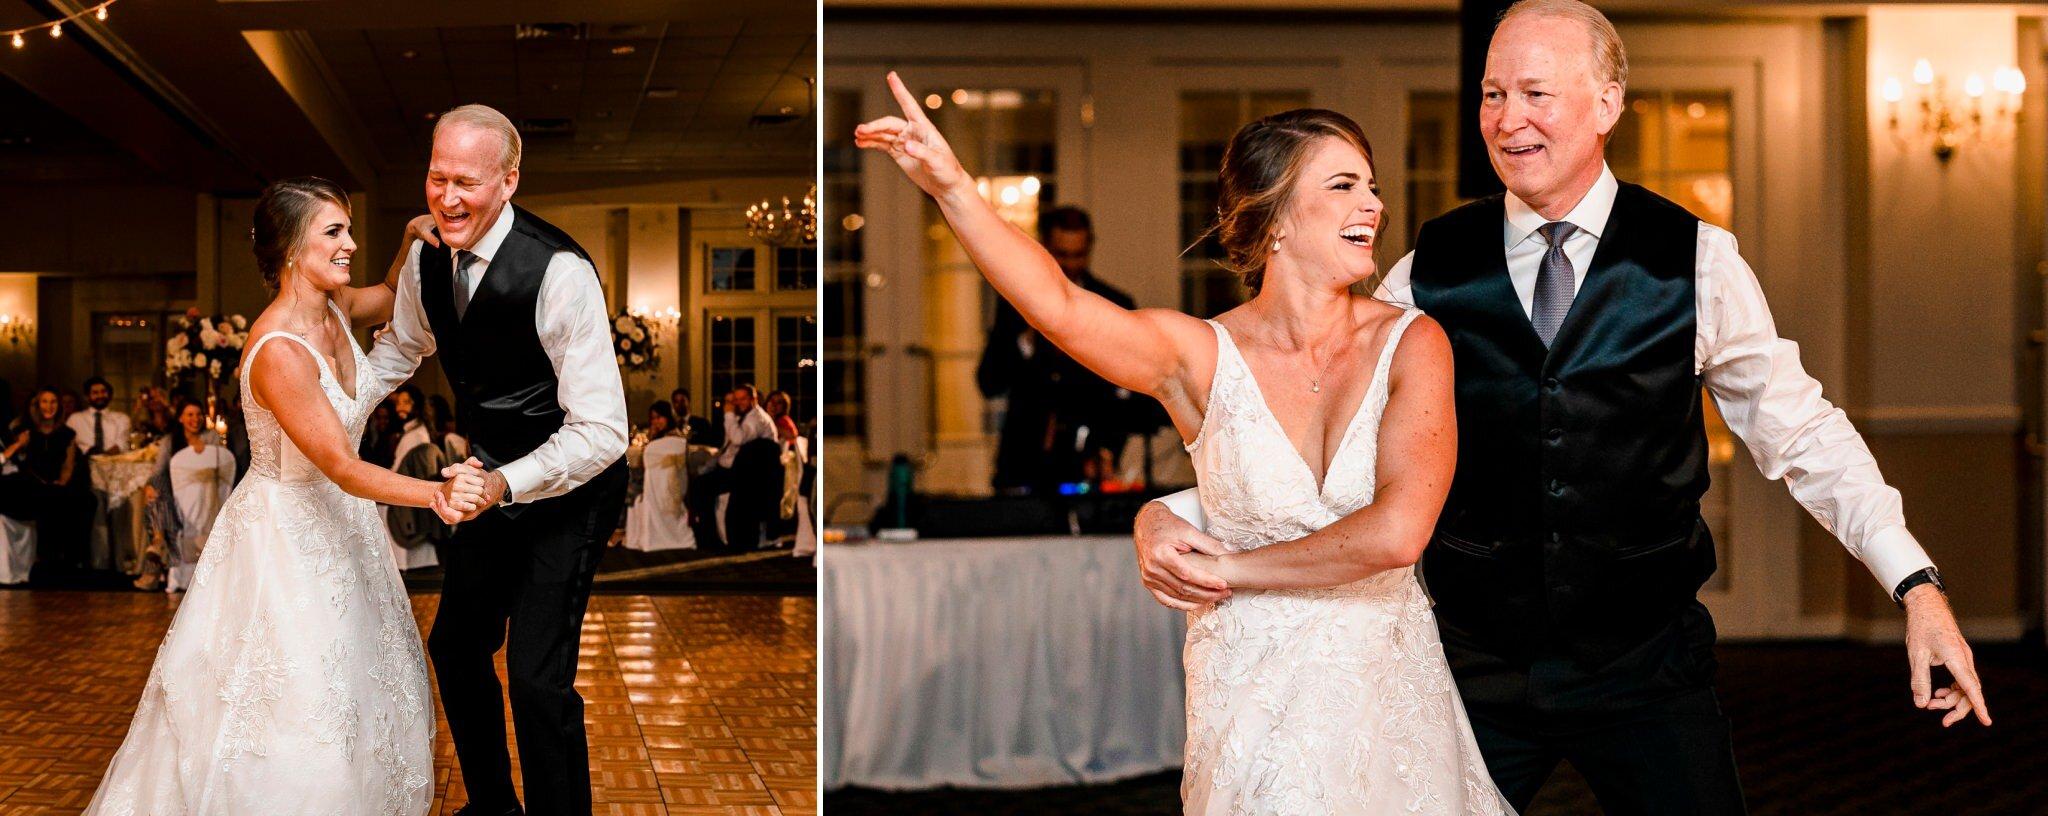 Coyle-Forsgate-Country-Club-Wedding-Photographer-65.JPG